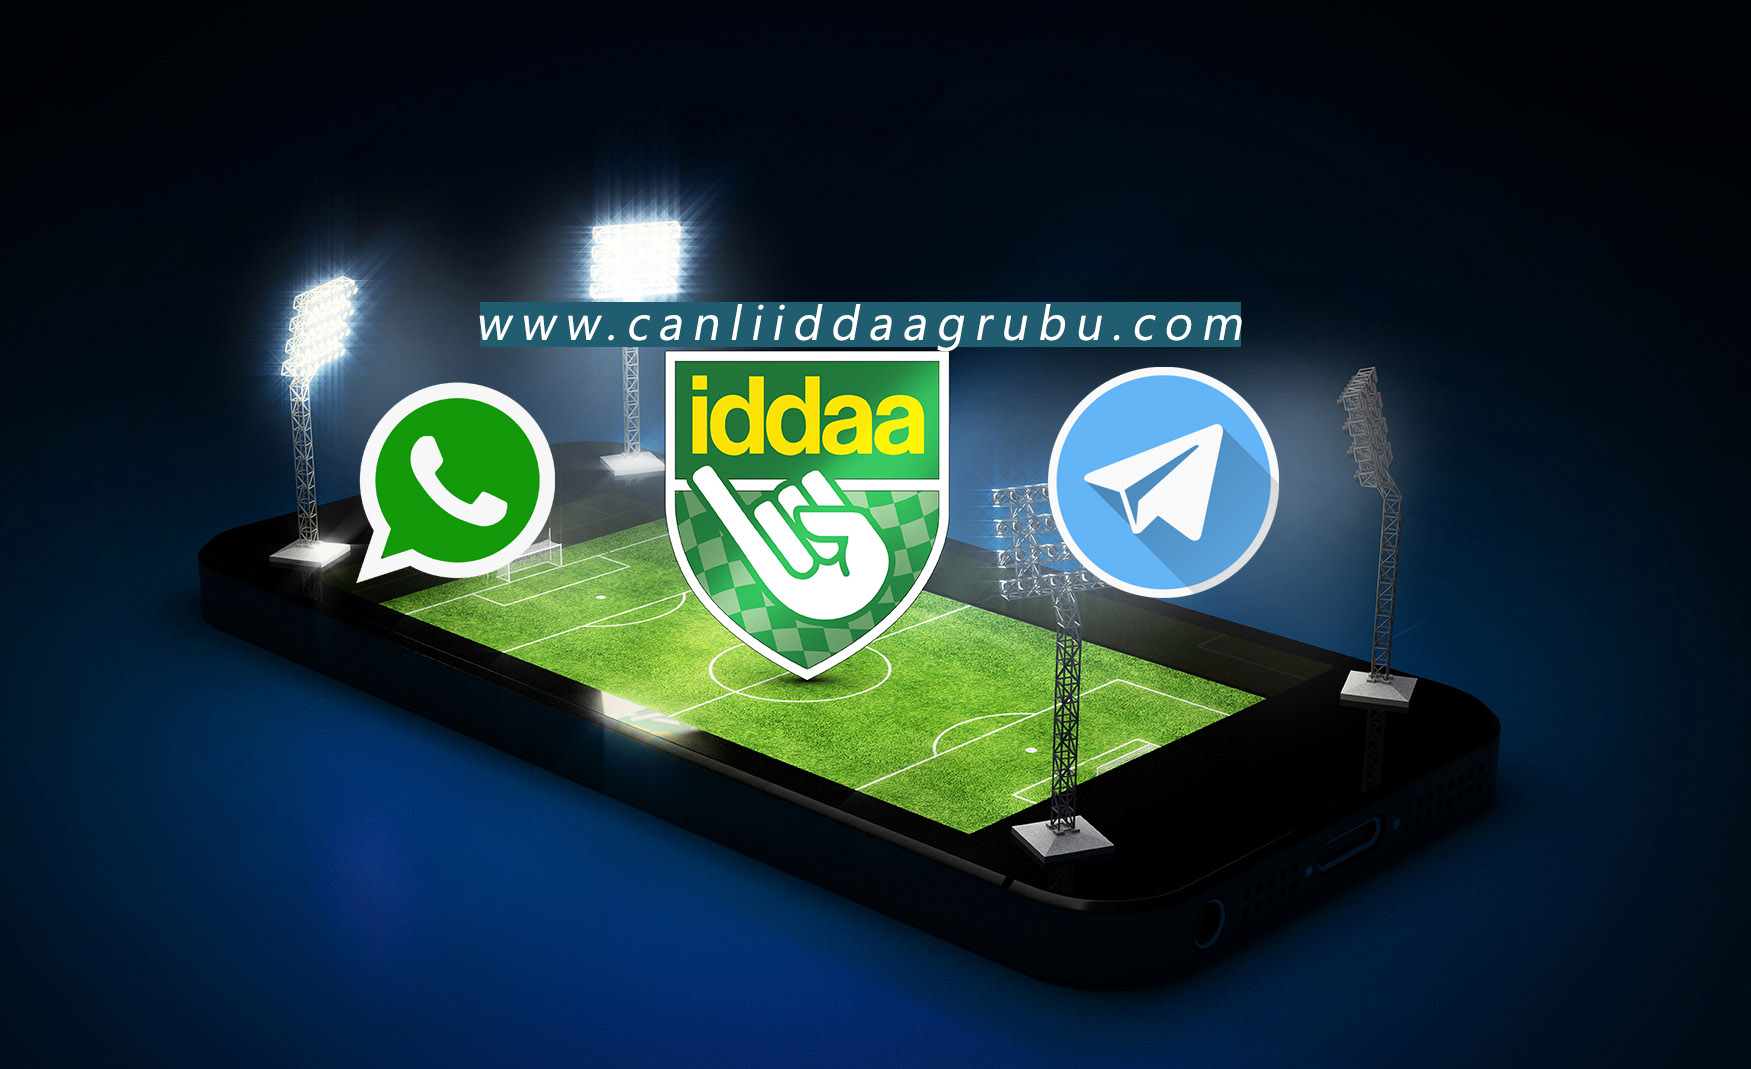 İddaa Vip Grup Whatsapp